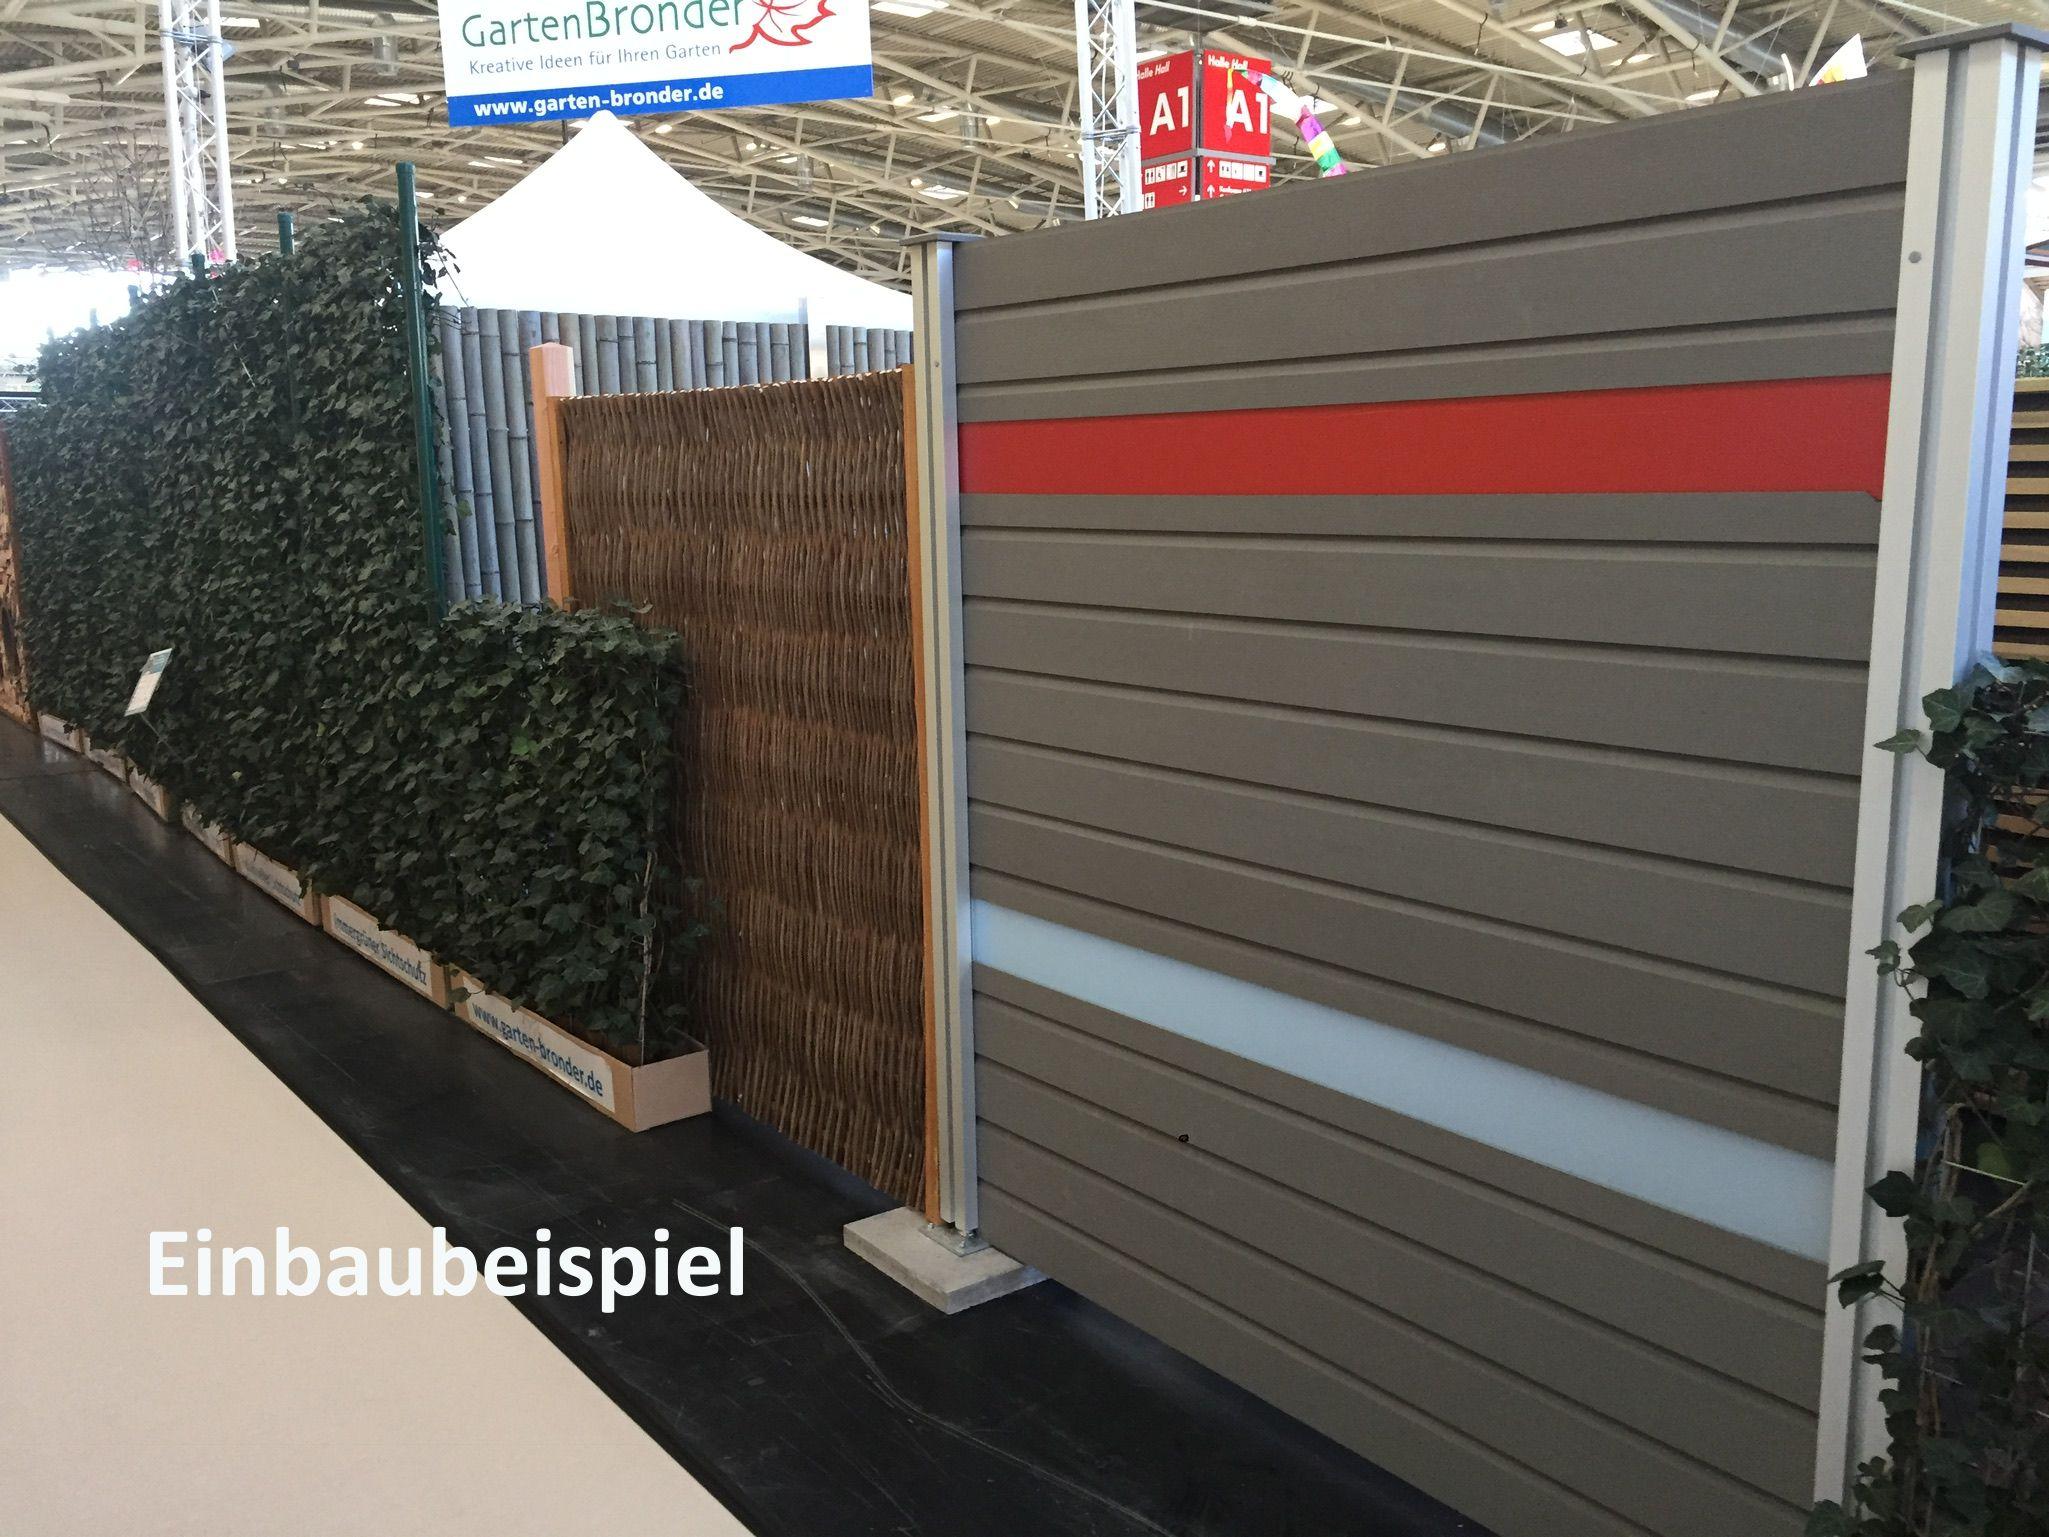 Multi Fence BPC Zaun 181 x 186 cm bronder shop